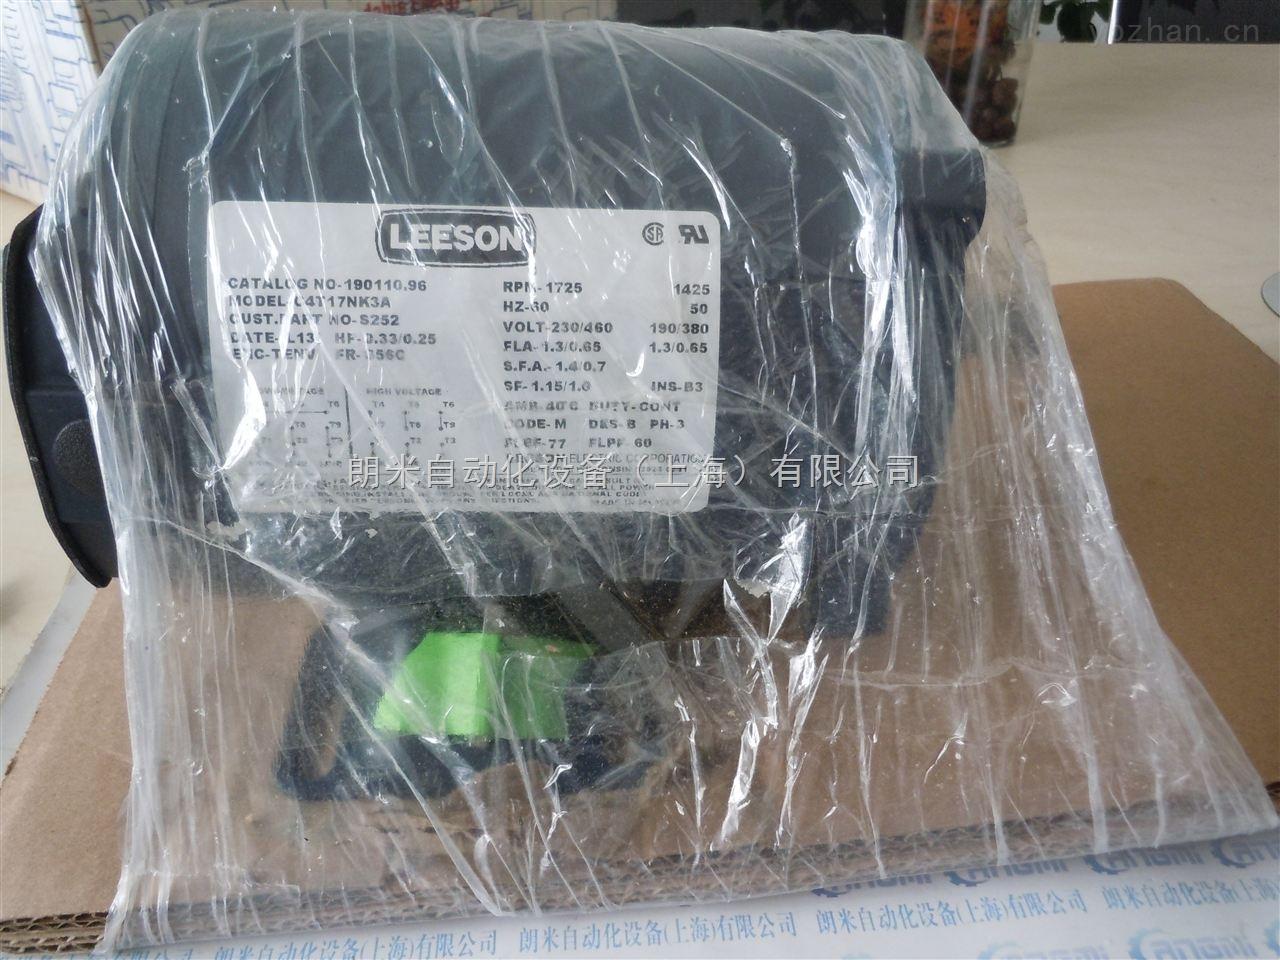 LEESON C4D17FK64A 已被替代